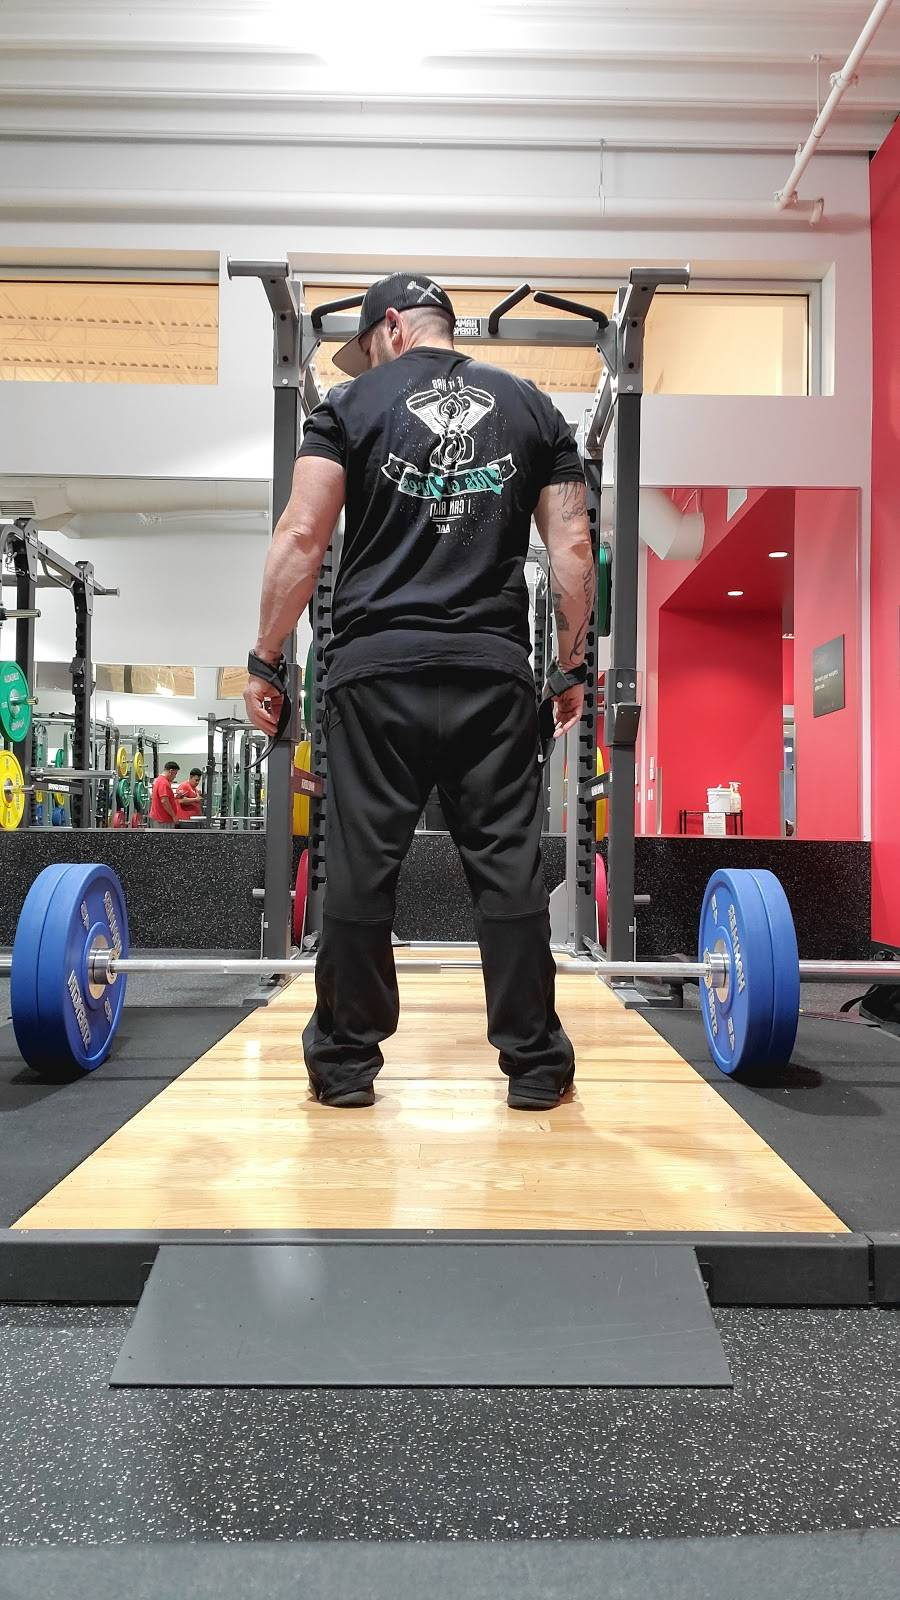 VASA Fitness - gym    Photo 6 of 7   Address: 15200 E Colfax Ave, Aurora, CO 80011, USA   Phone: (719) 294-6630